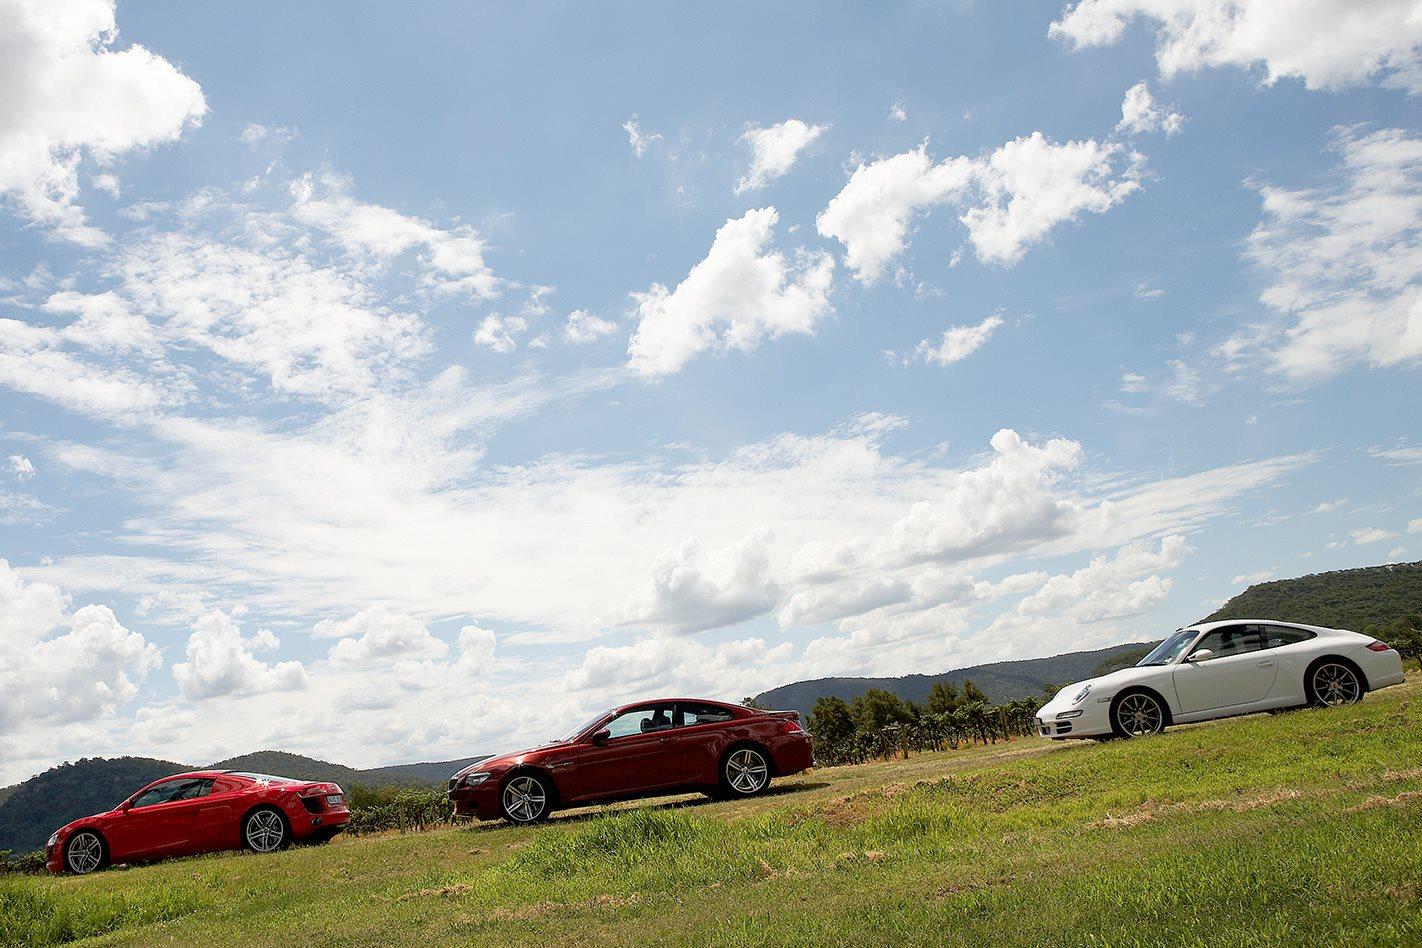 Audi R8 vs Porsche 911 Carrera S vs BMW M6 side